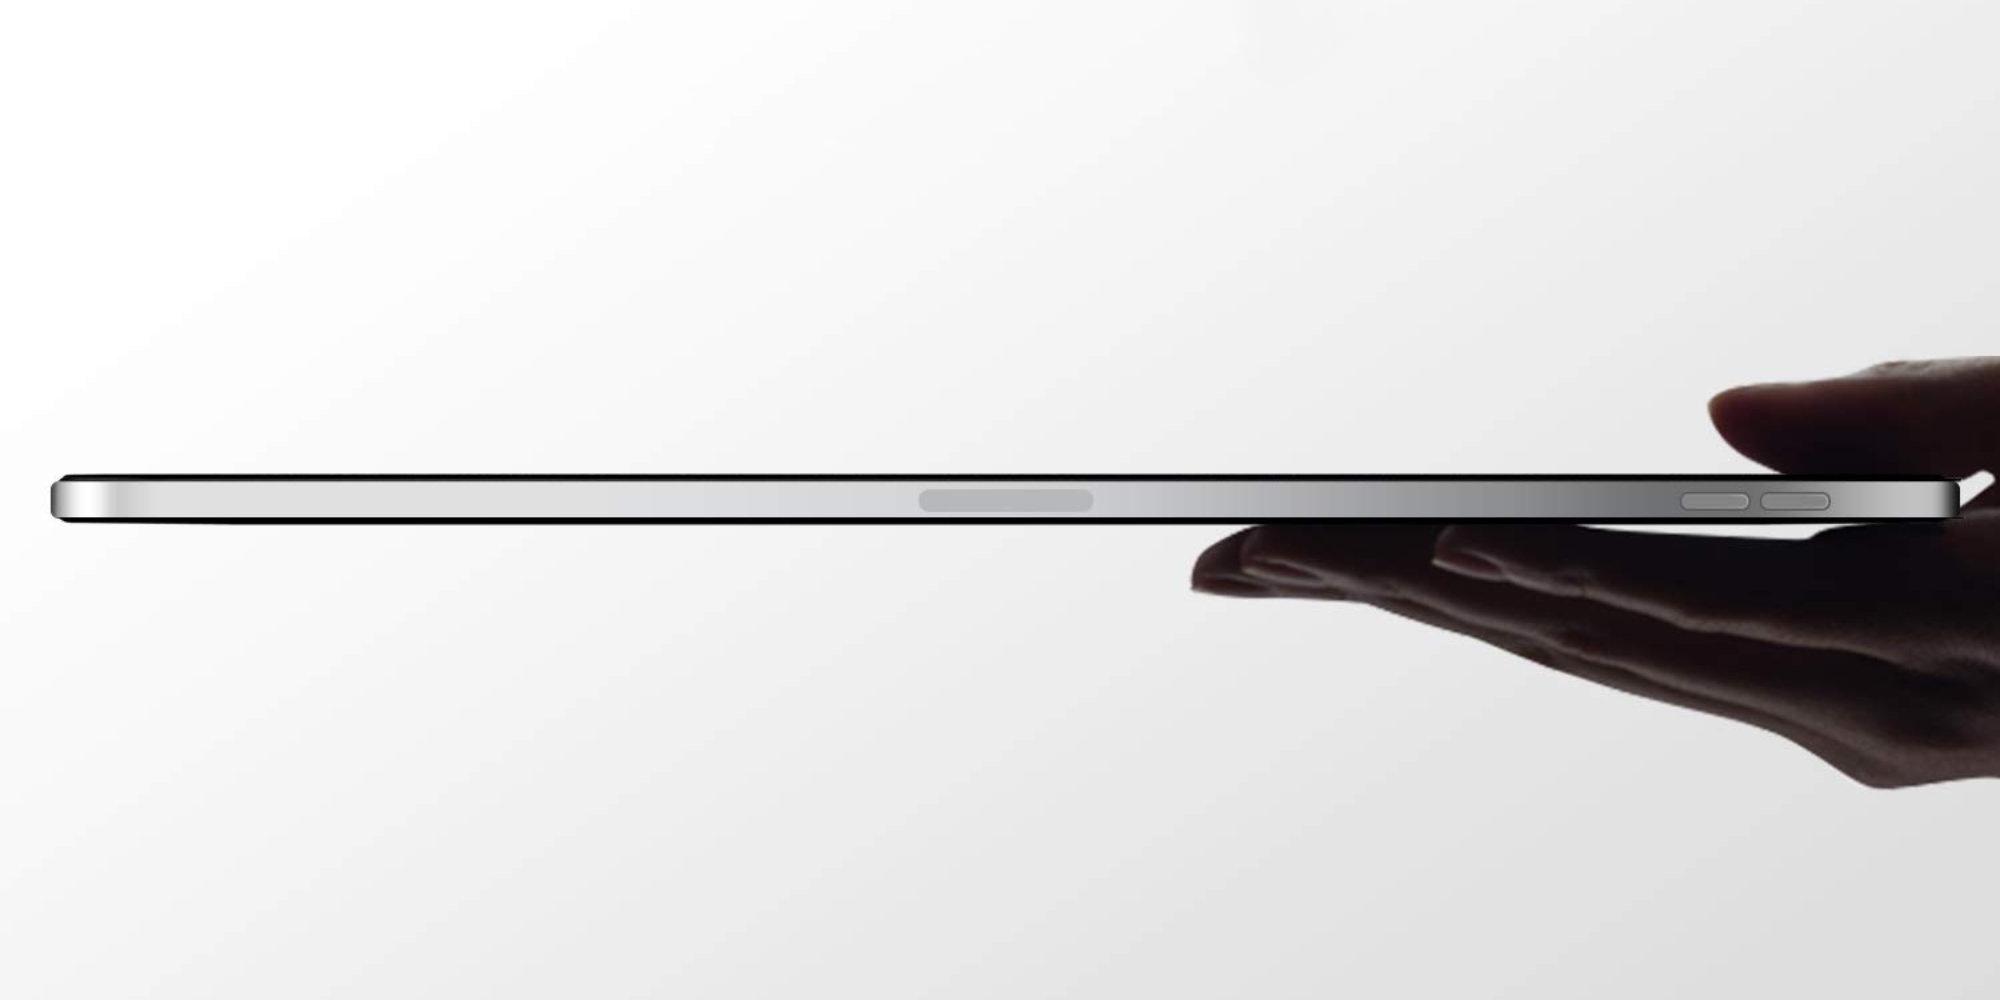 Act fast, just $2 nabs MoKo's 11-inch iPad Pro Smart Folio Case (85% off)